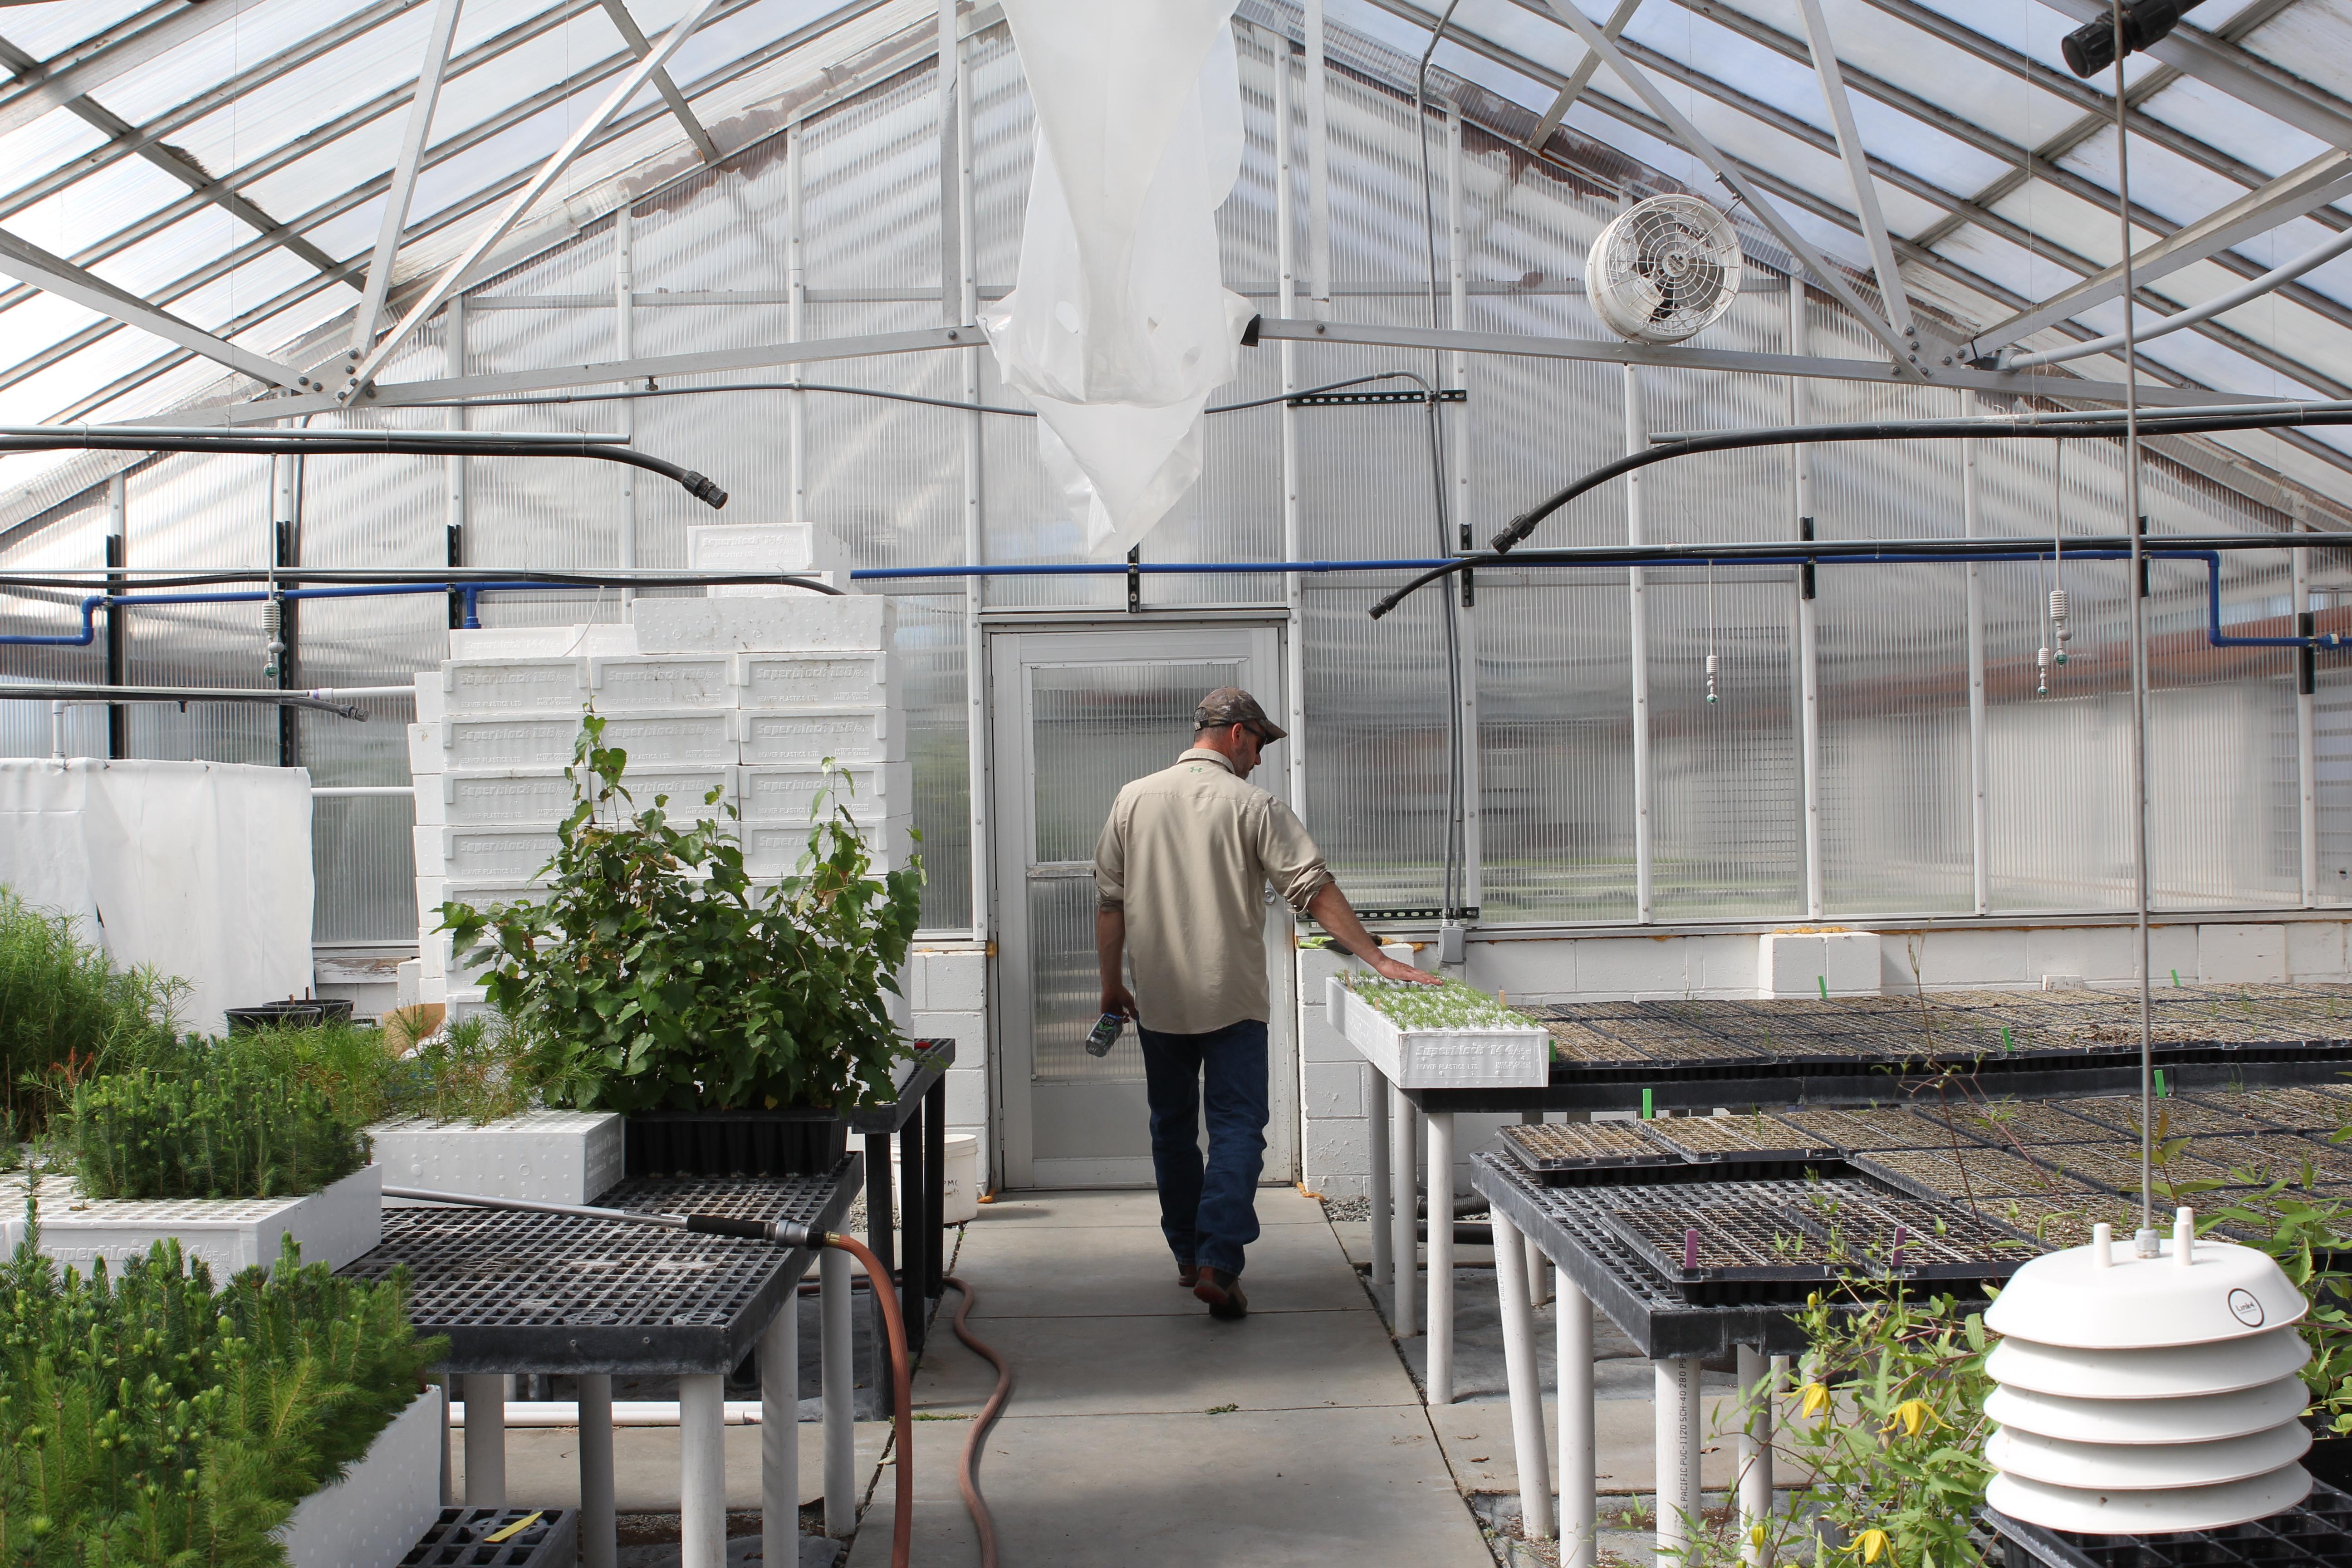 Could industrial hemp become the next big crop for Alaska?